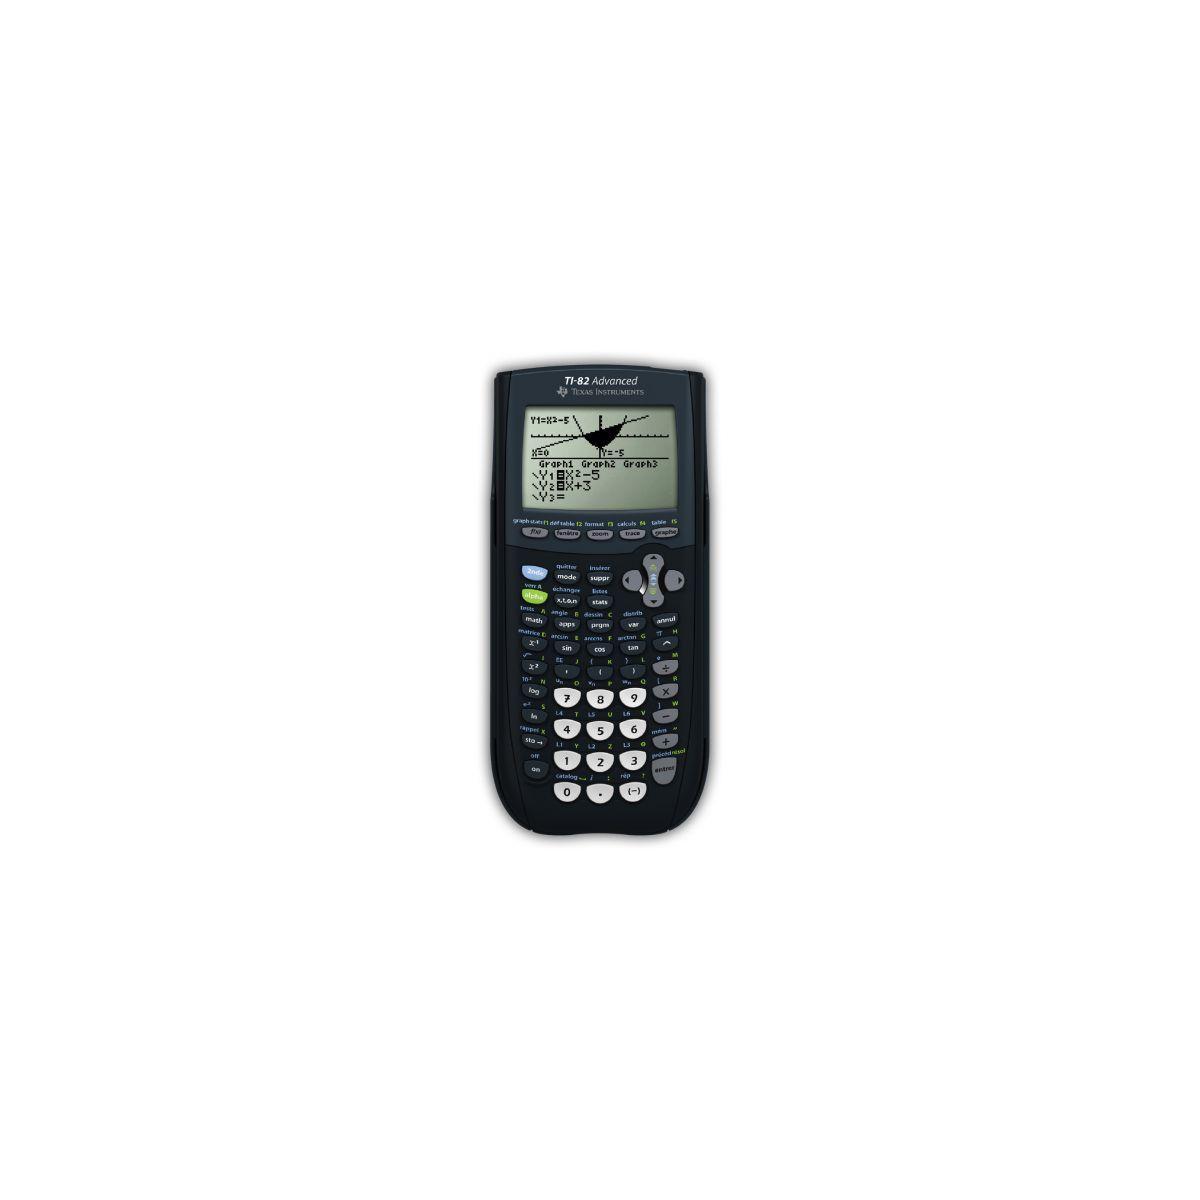 Calculatrice graphique texas instruments ti-82 advanced (photo)